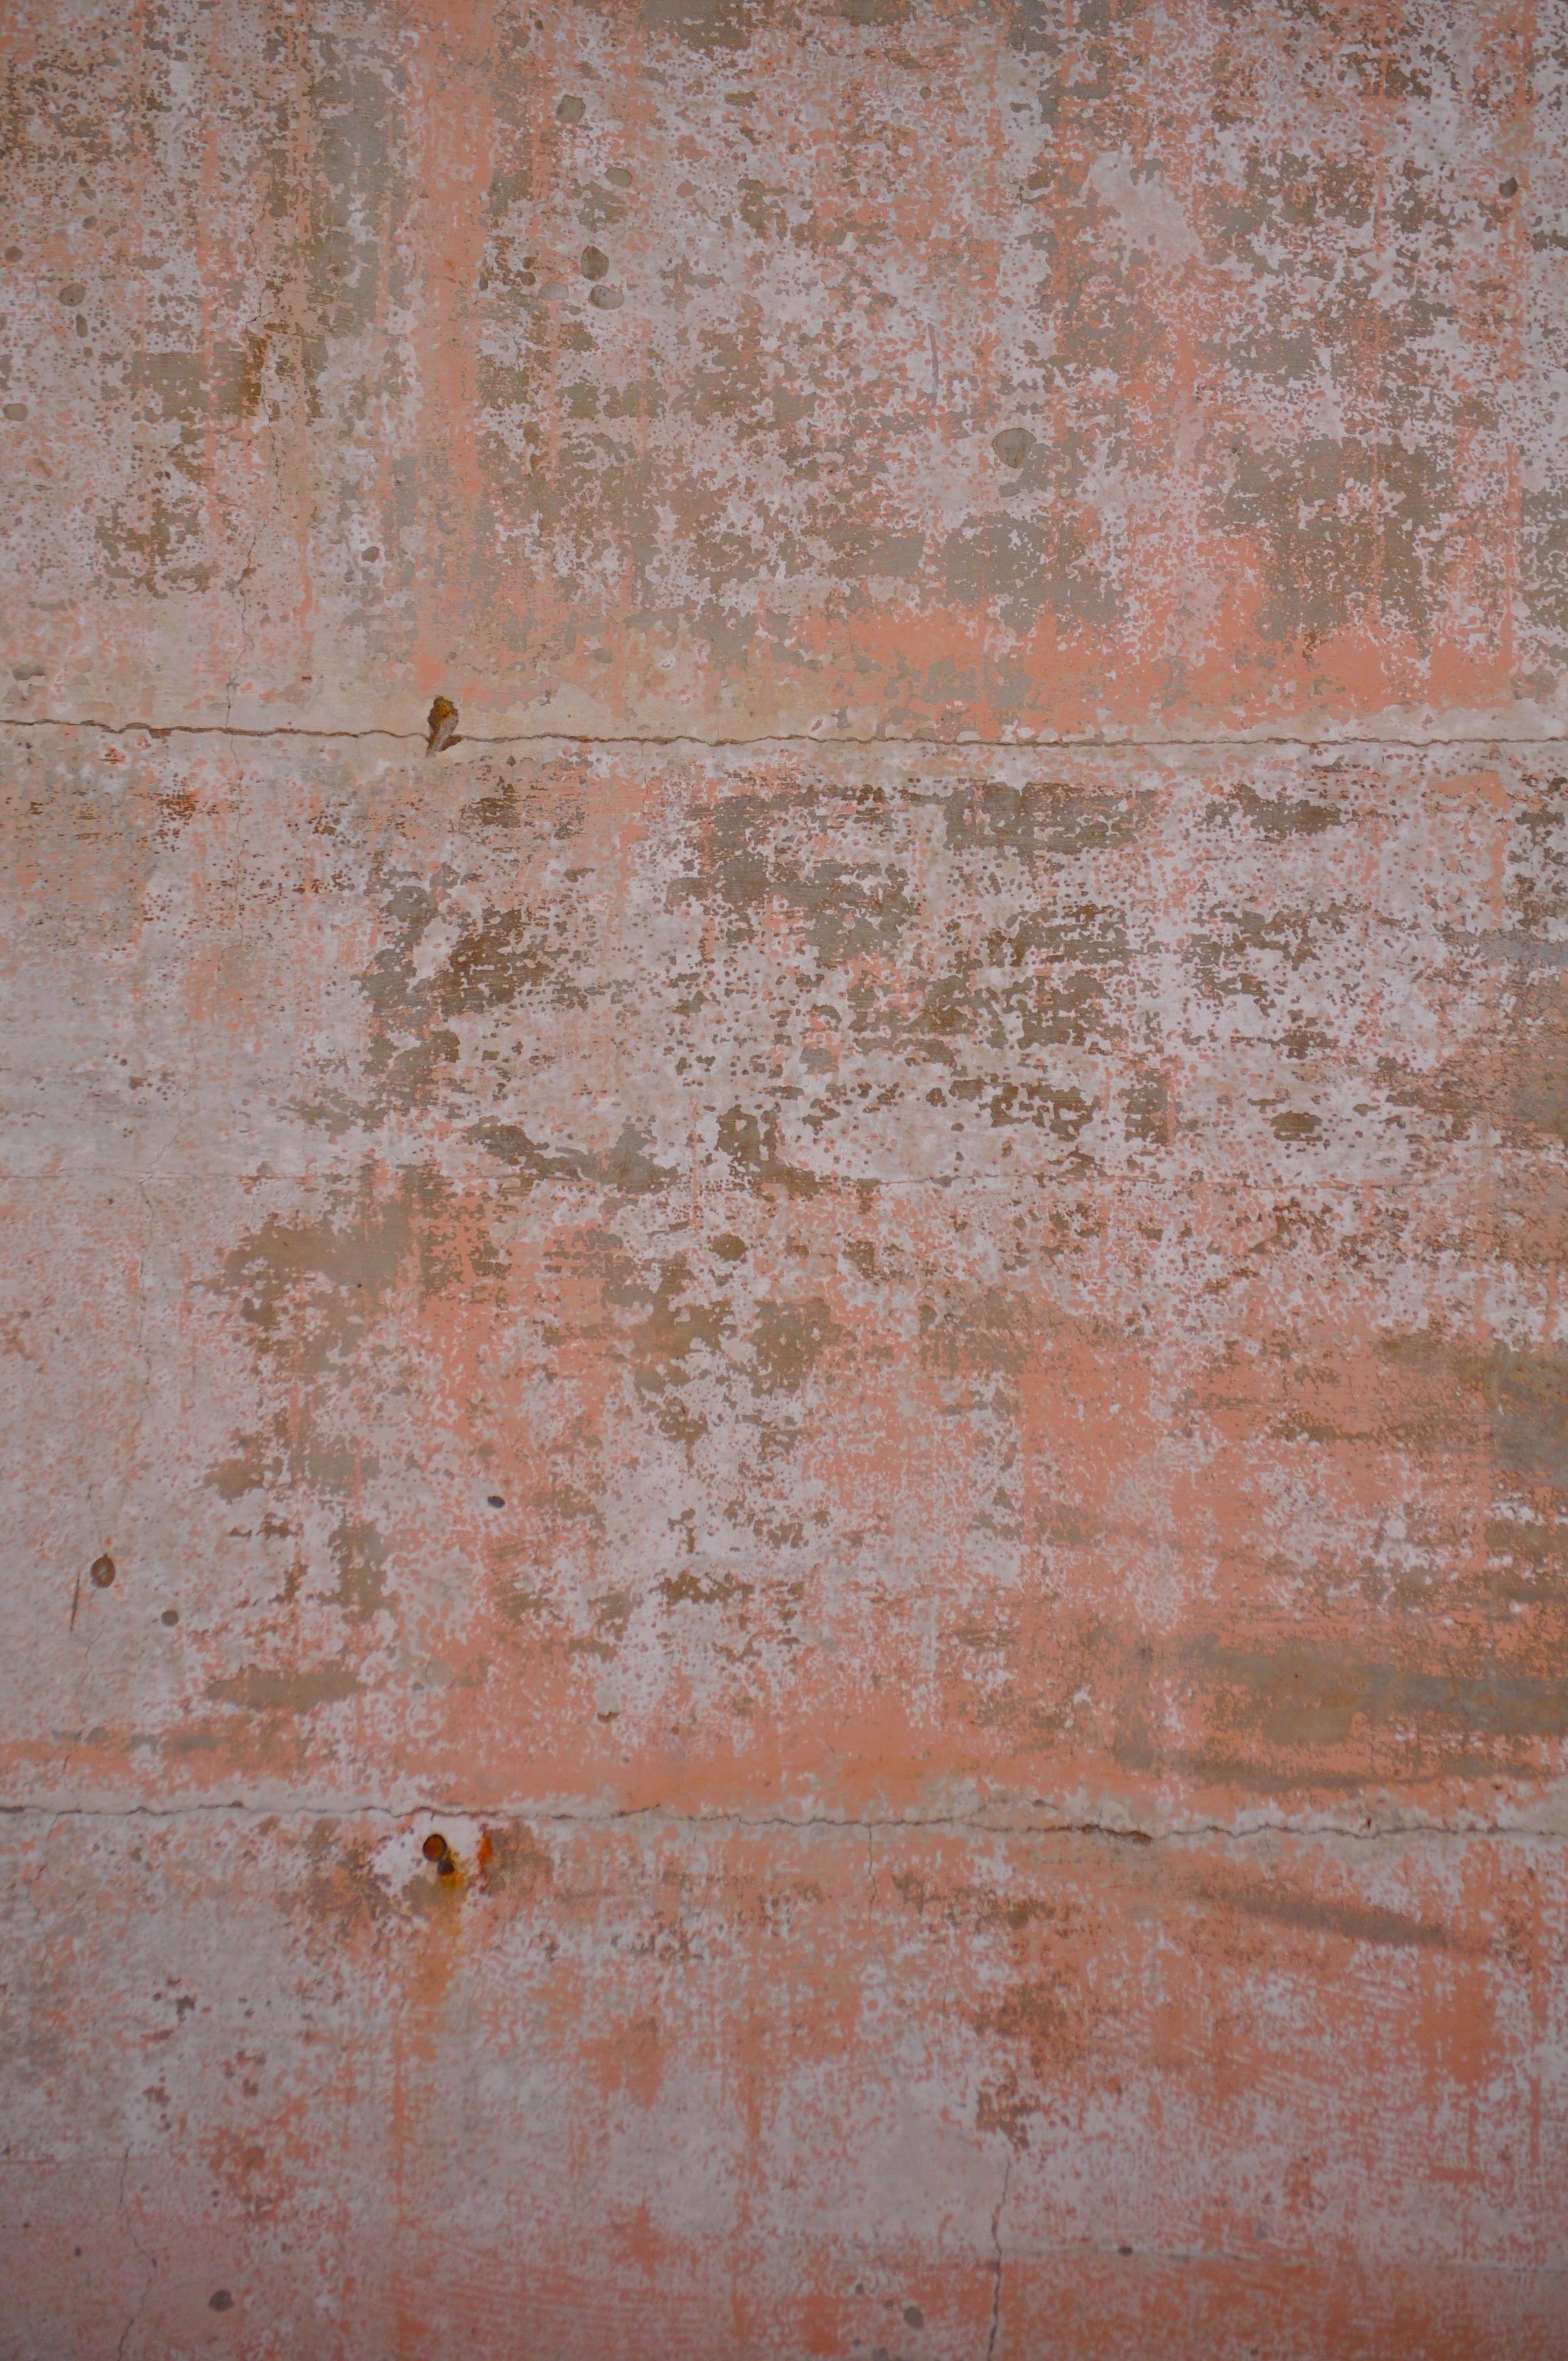 Yale-Columbia pink concrete